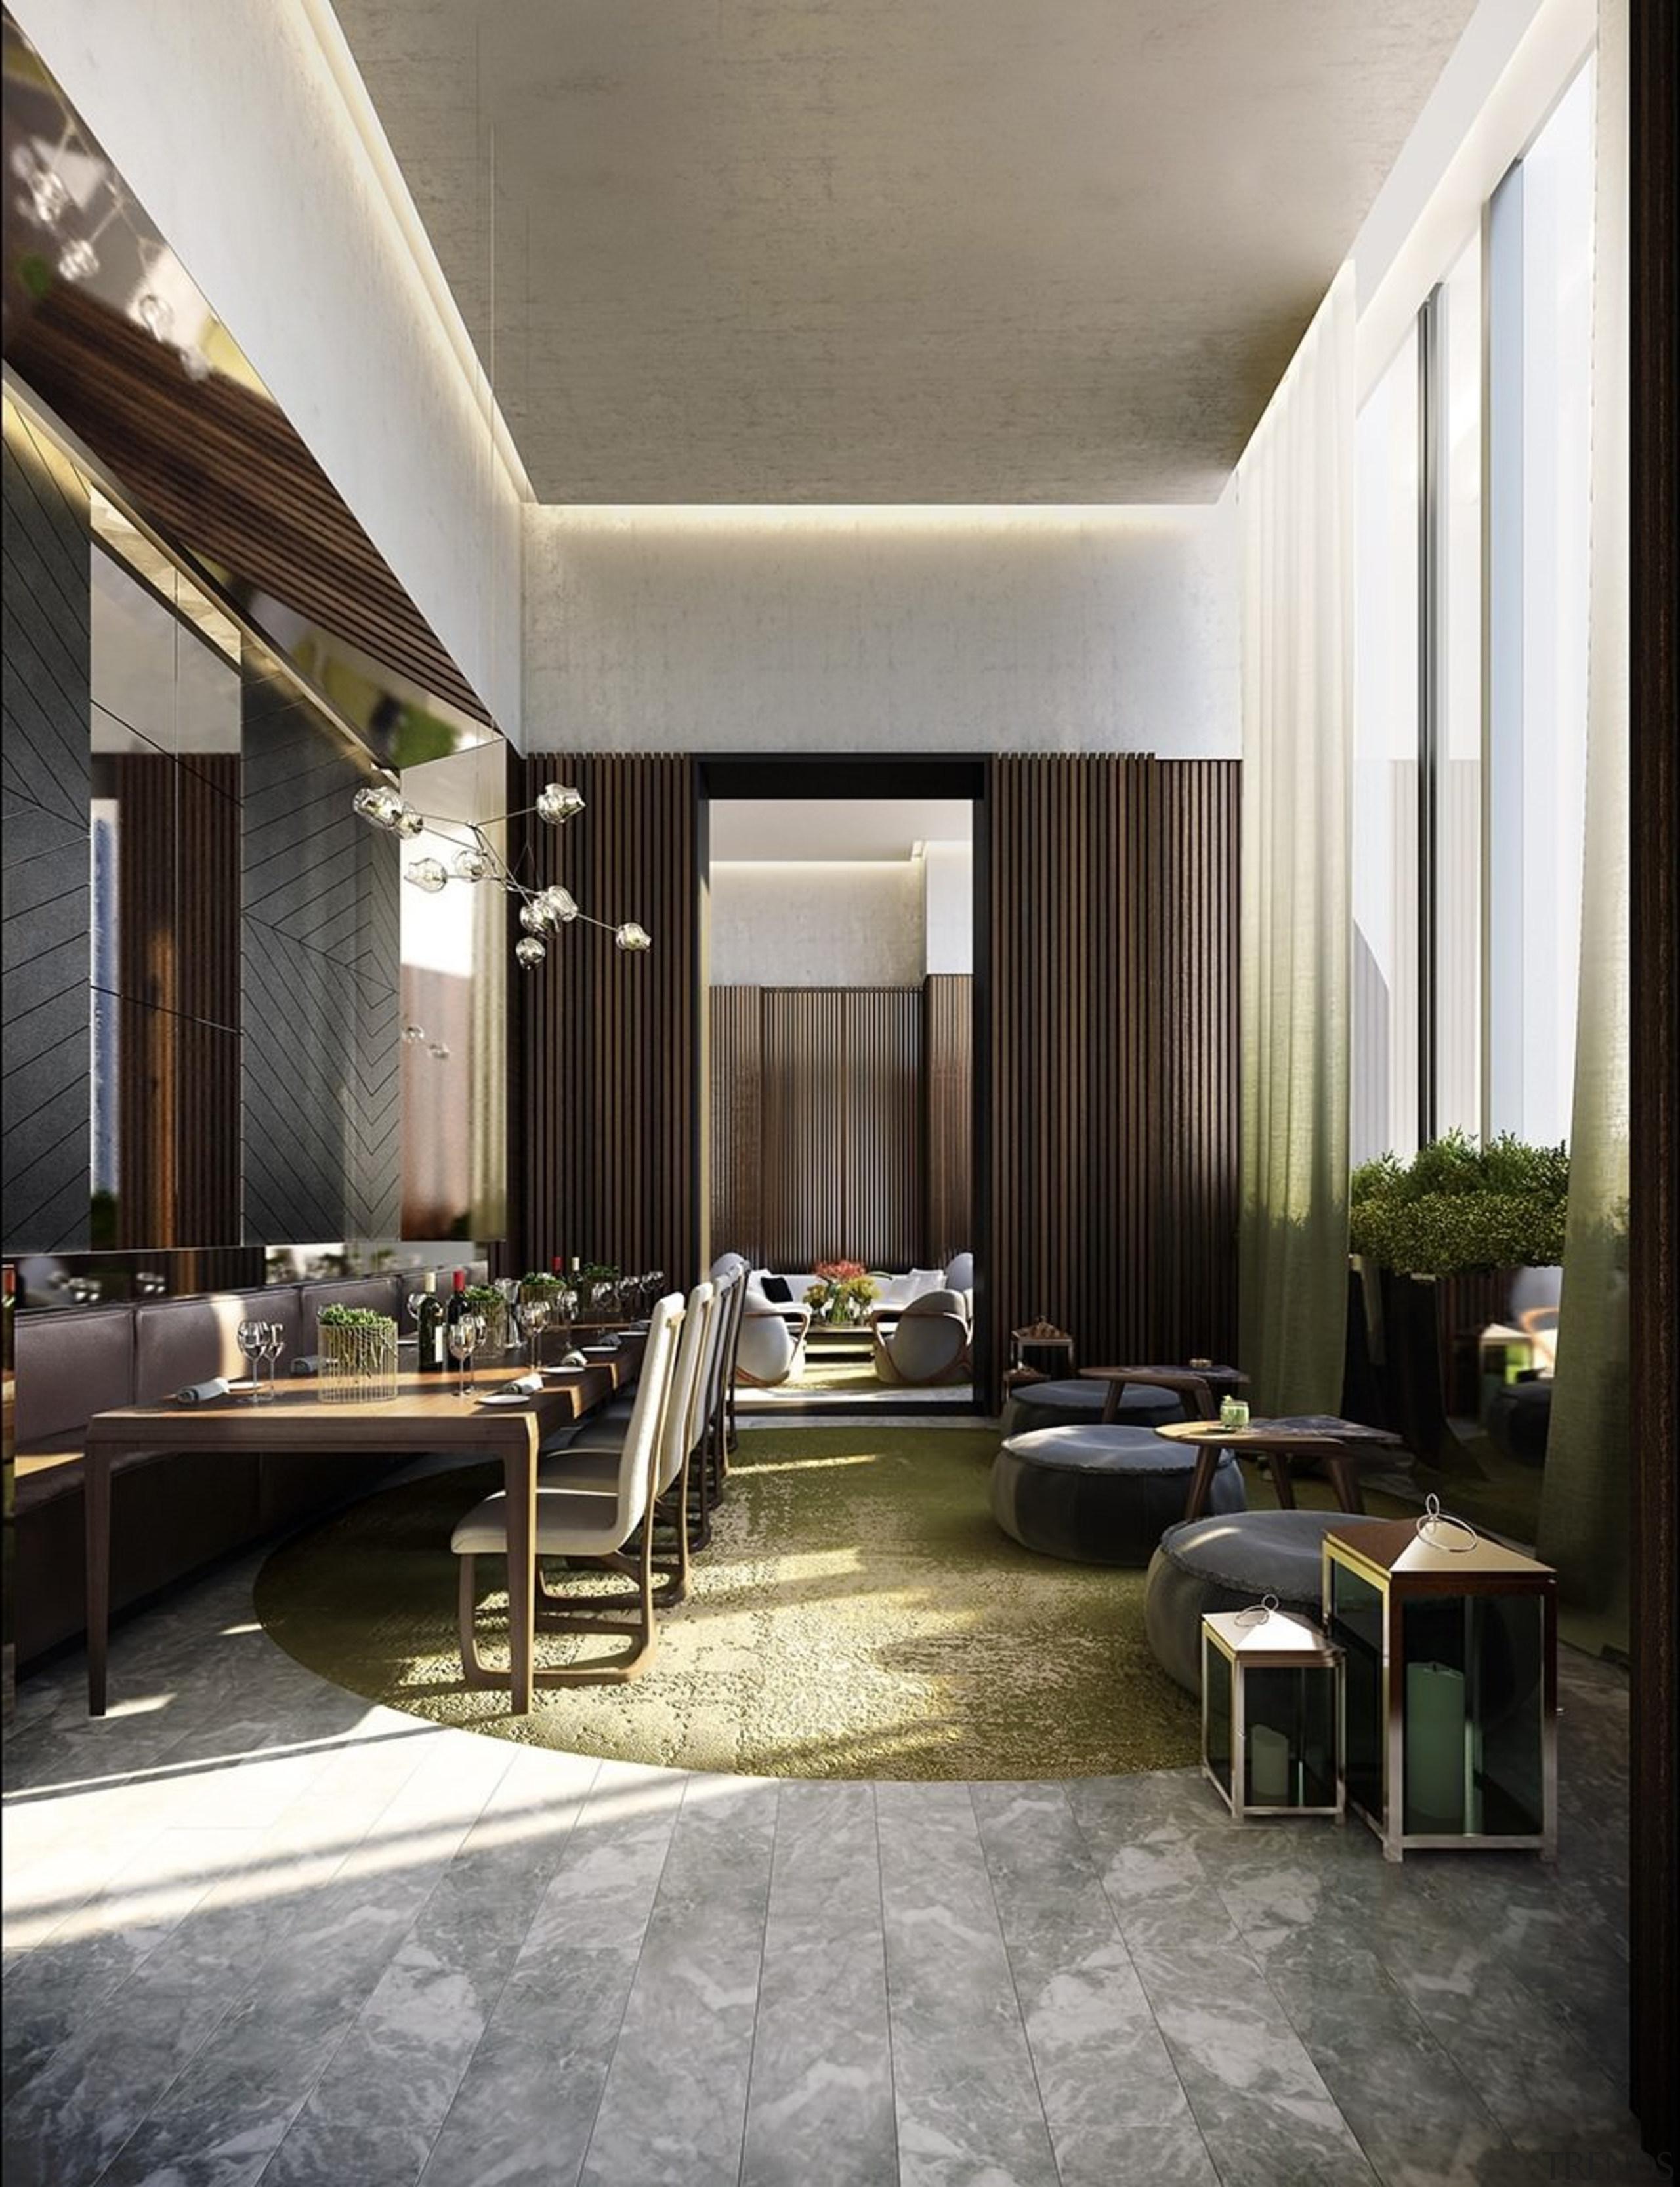 Recessed lighting keeps this ceiling clean - Recessed ceiling, floor, flooring, interior design, living room, lobby, black, gray, white